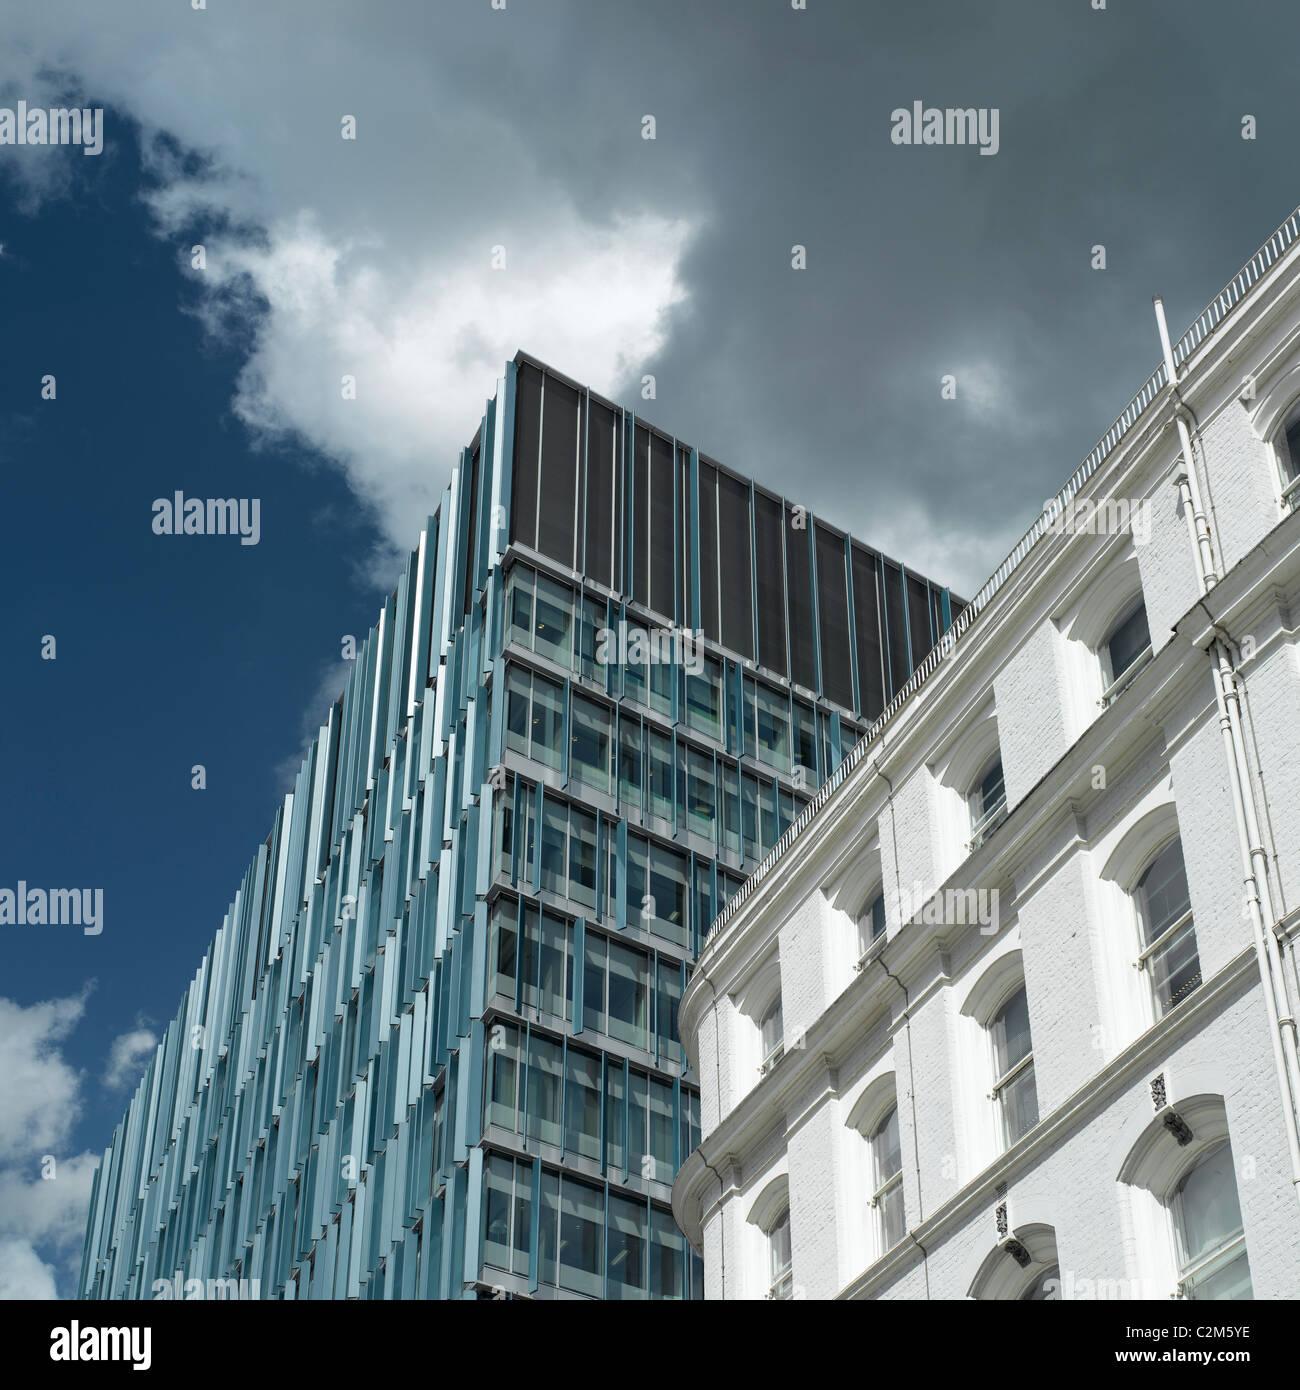 Bankside 1, Southwark, London. - Stock Image